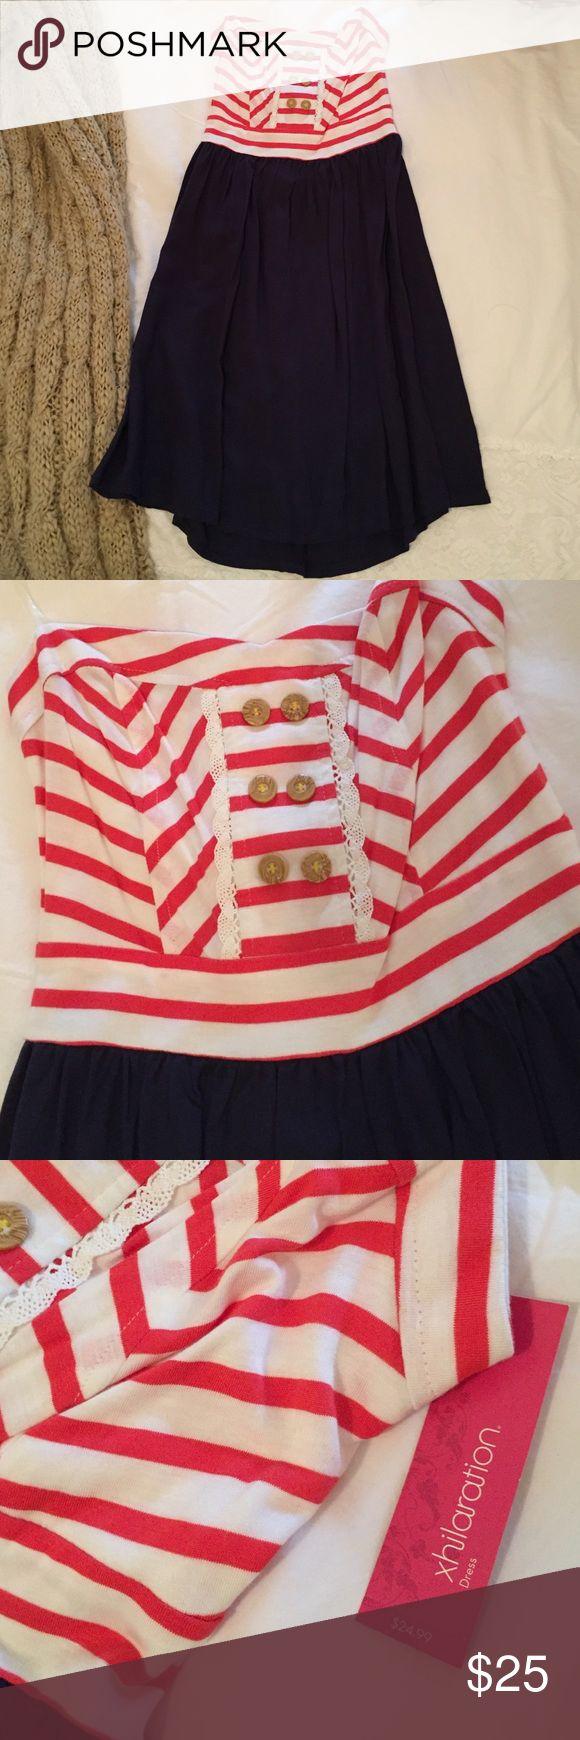 XHILARATION DRESS NWT. Cute, casual strapless dress. Perfect for summer. Never worn. Xhilaration Dresses Strapless